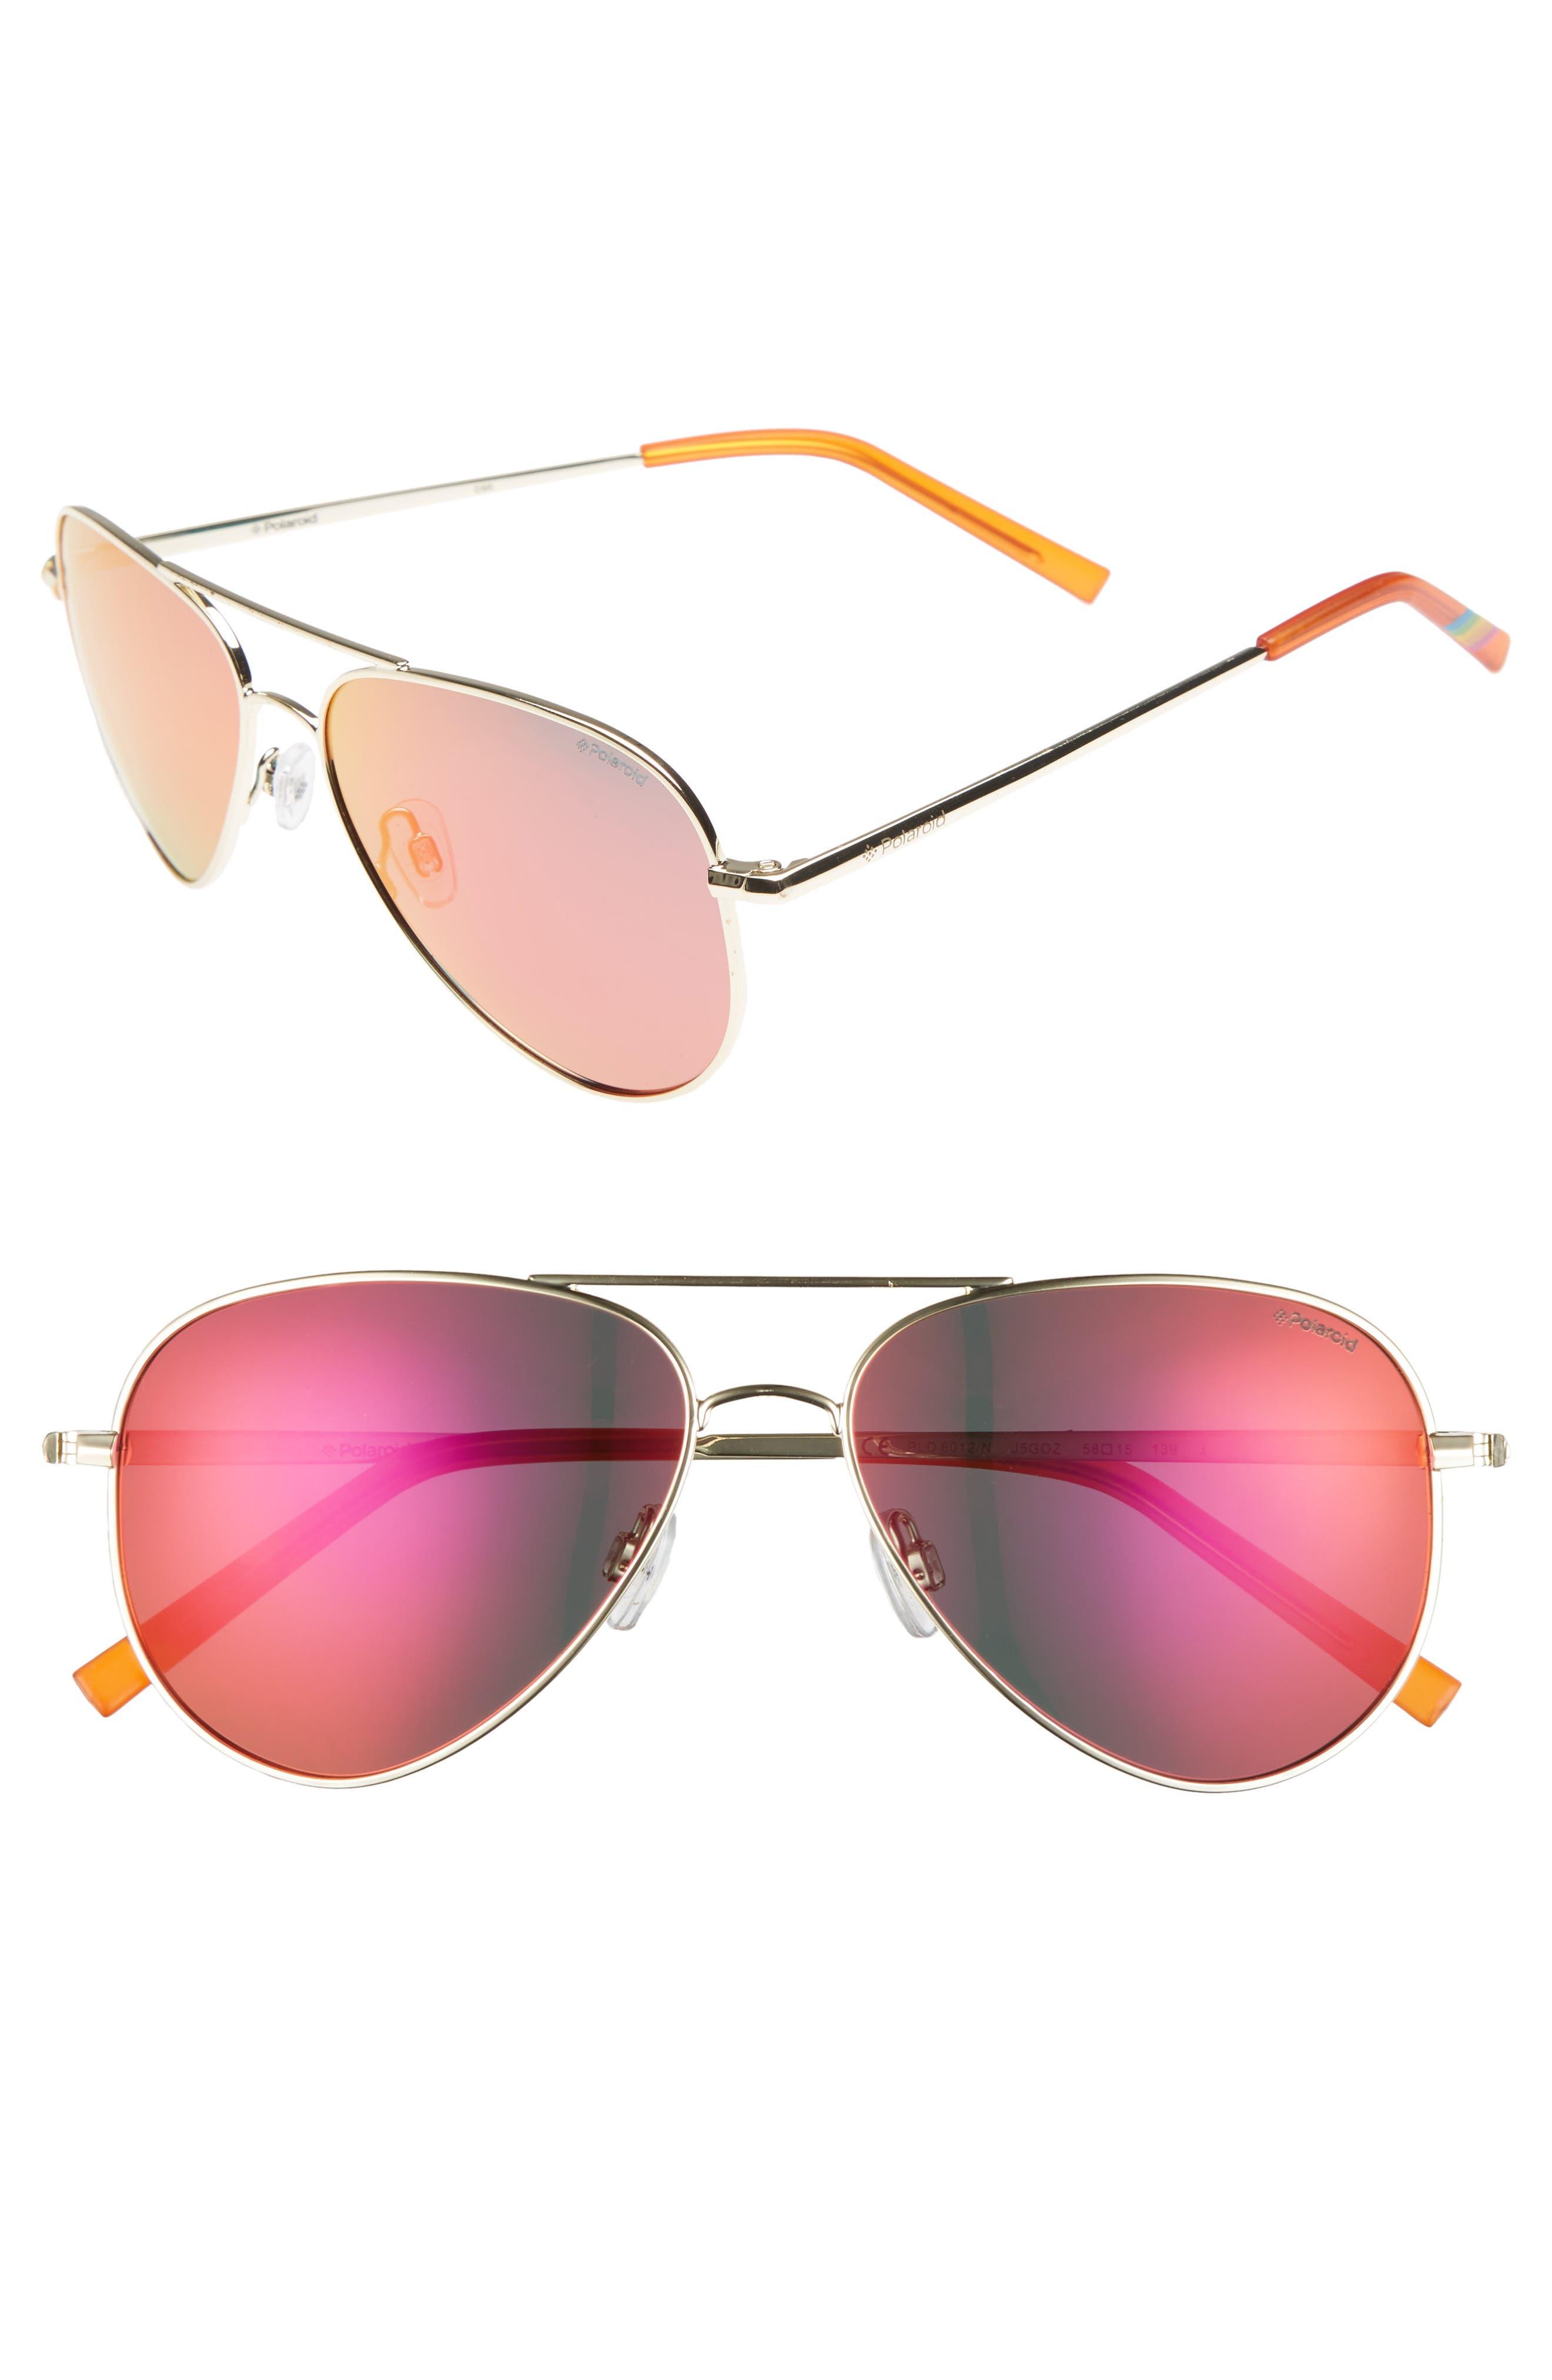 56mm Polarized Aviator Sunglasses,                         Main,                         color, Gold/ Red Mirror